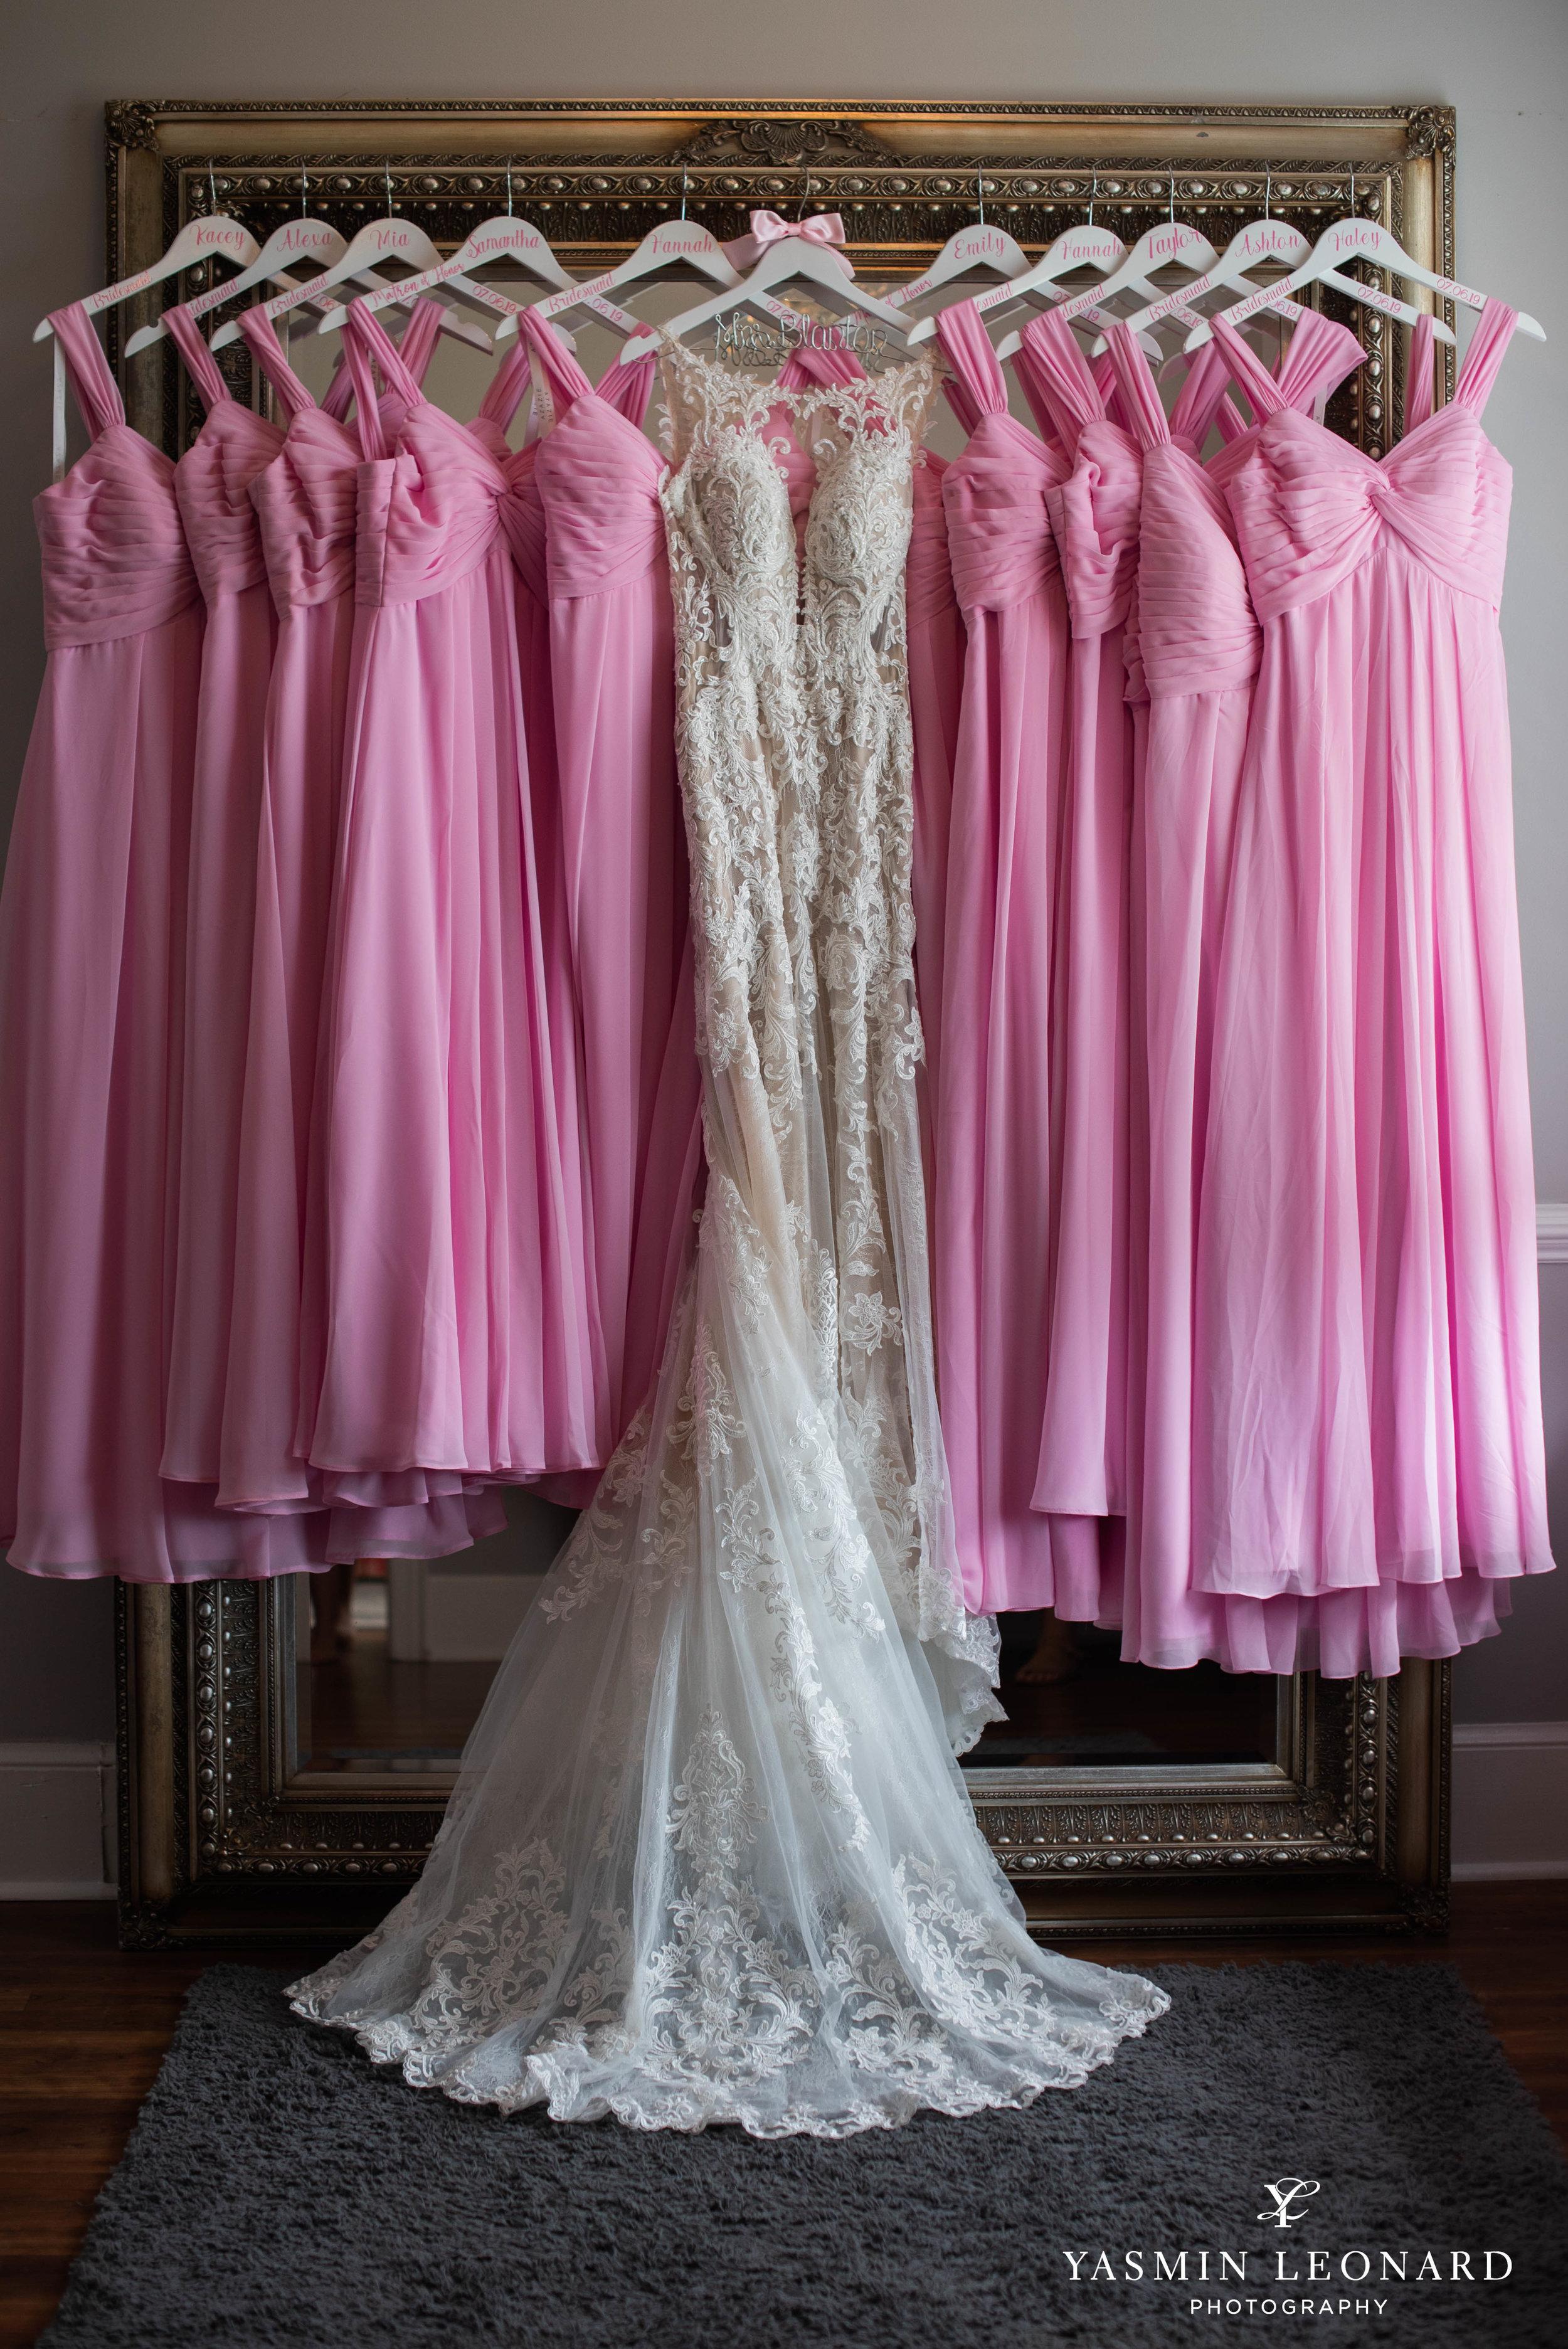 Separk Mansion - NC Weddings - Gastonia Wedding - NC Wedding Venues - Pink and Blue Wedding Ideas - Pink Bridesmaid Dresses - Yasmin Leonard Photography-6.jpg